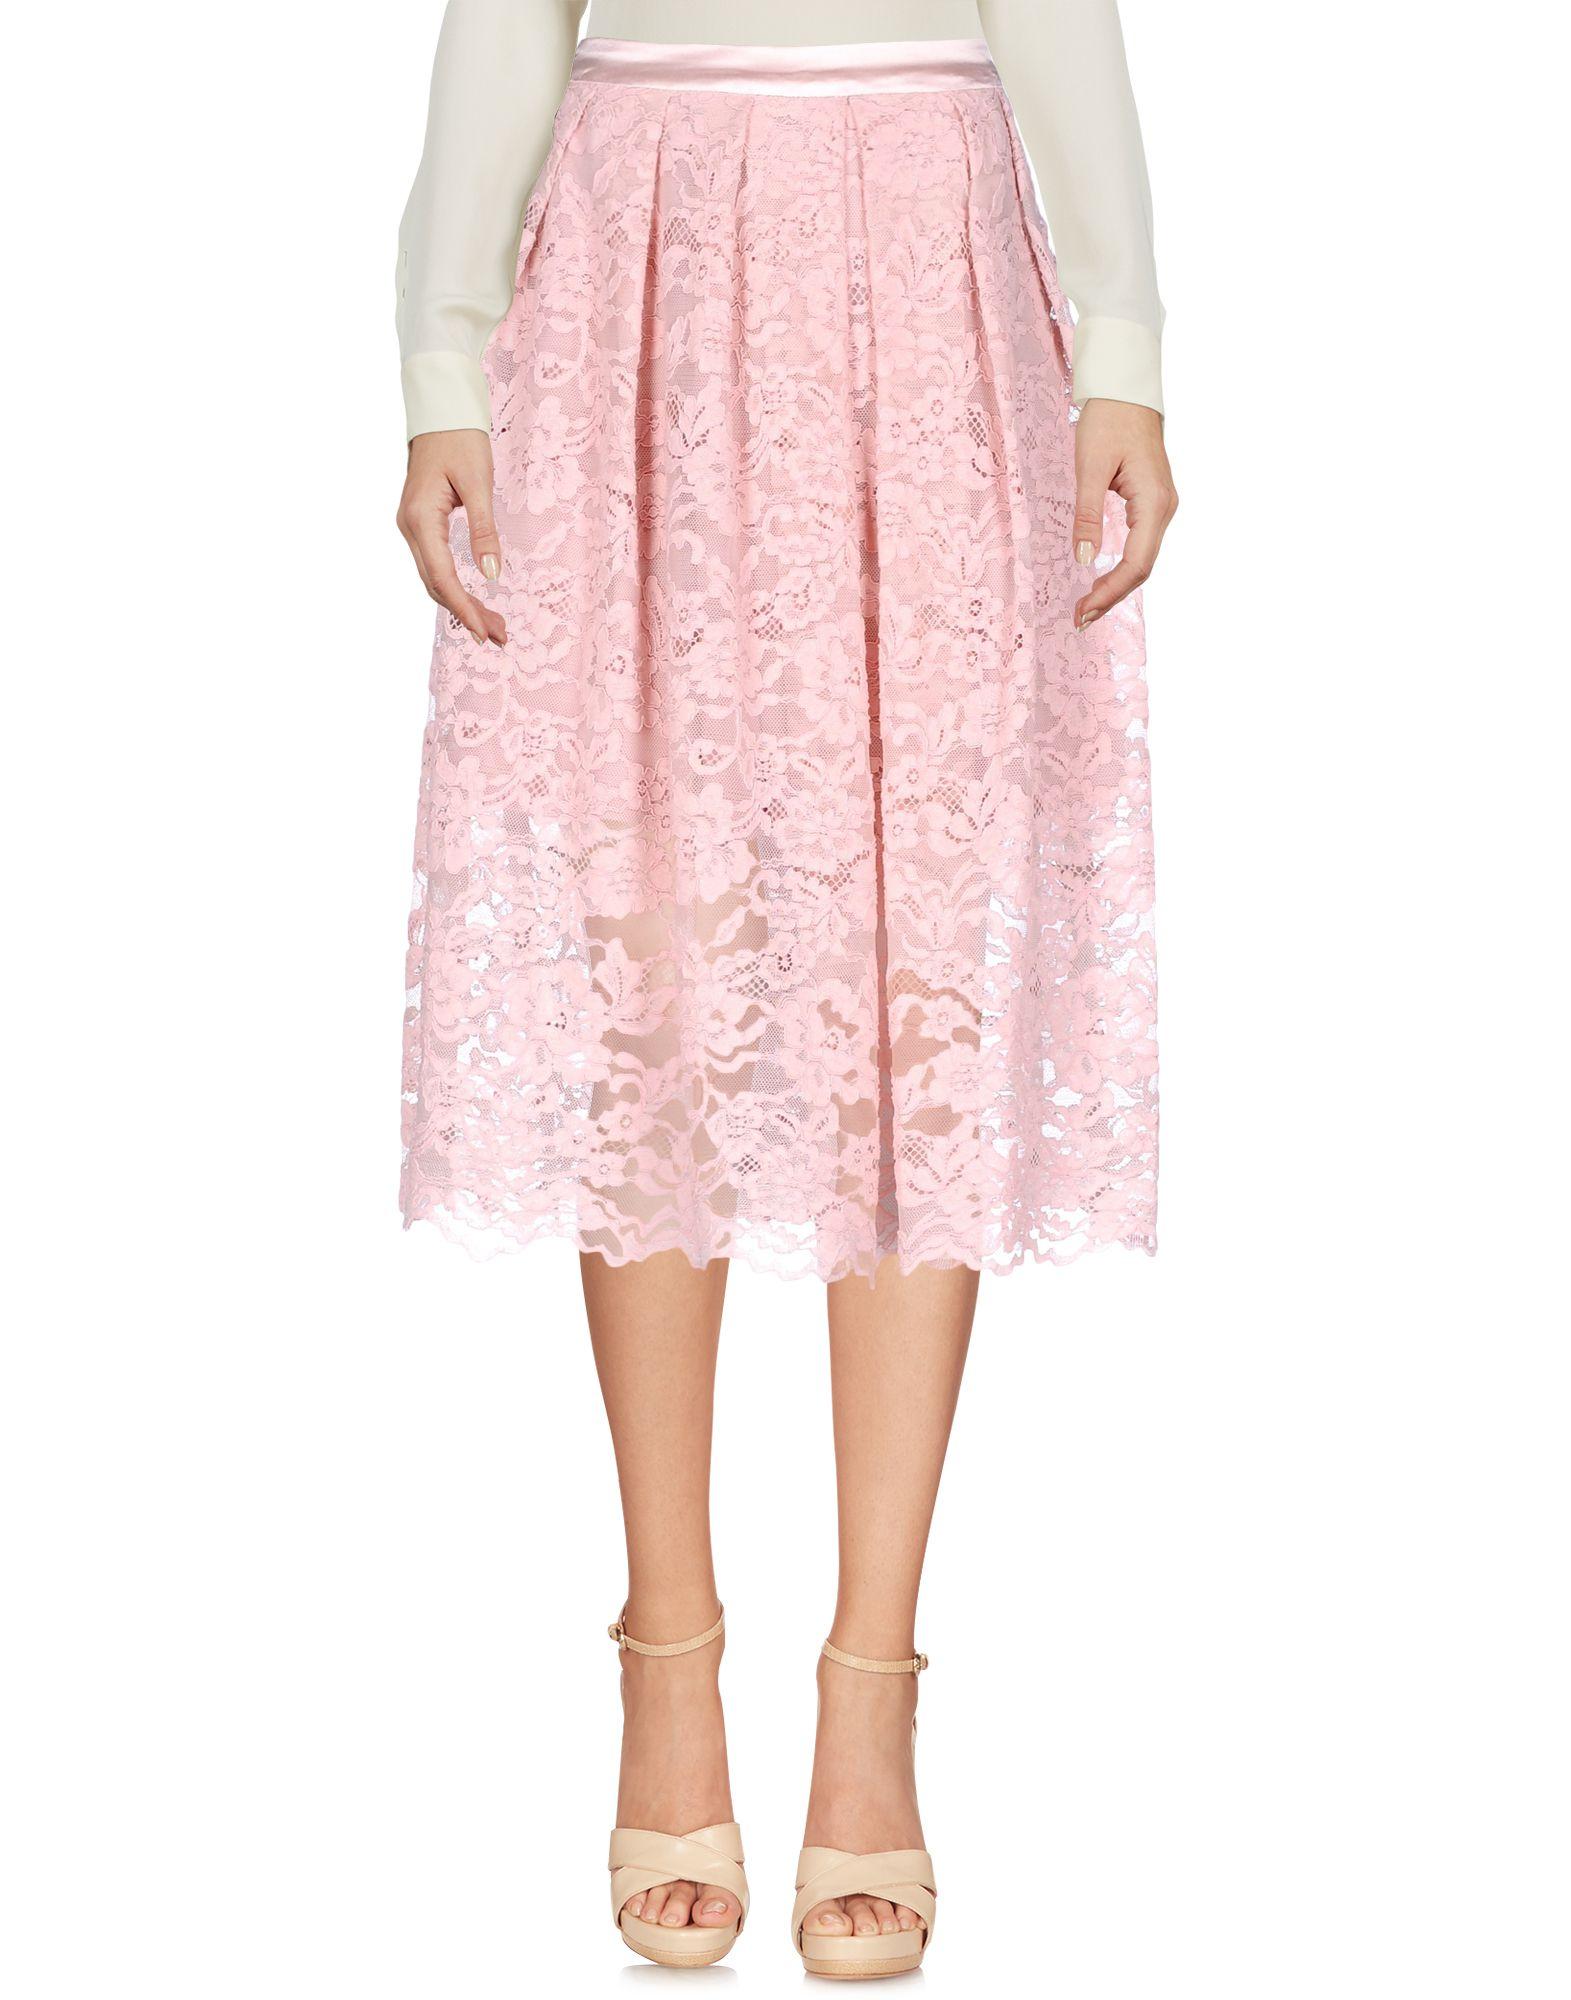 INTERDEE | INTERDEE® 3/4 Length Skirts 42642294 | Goxip